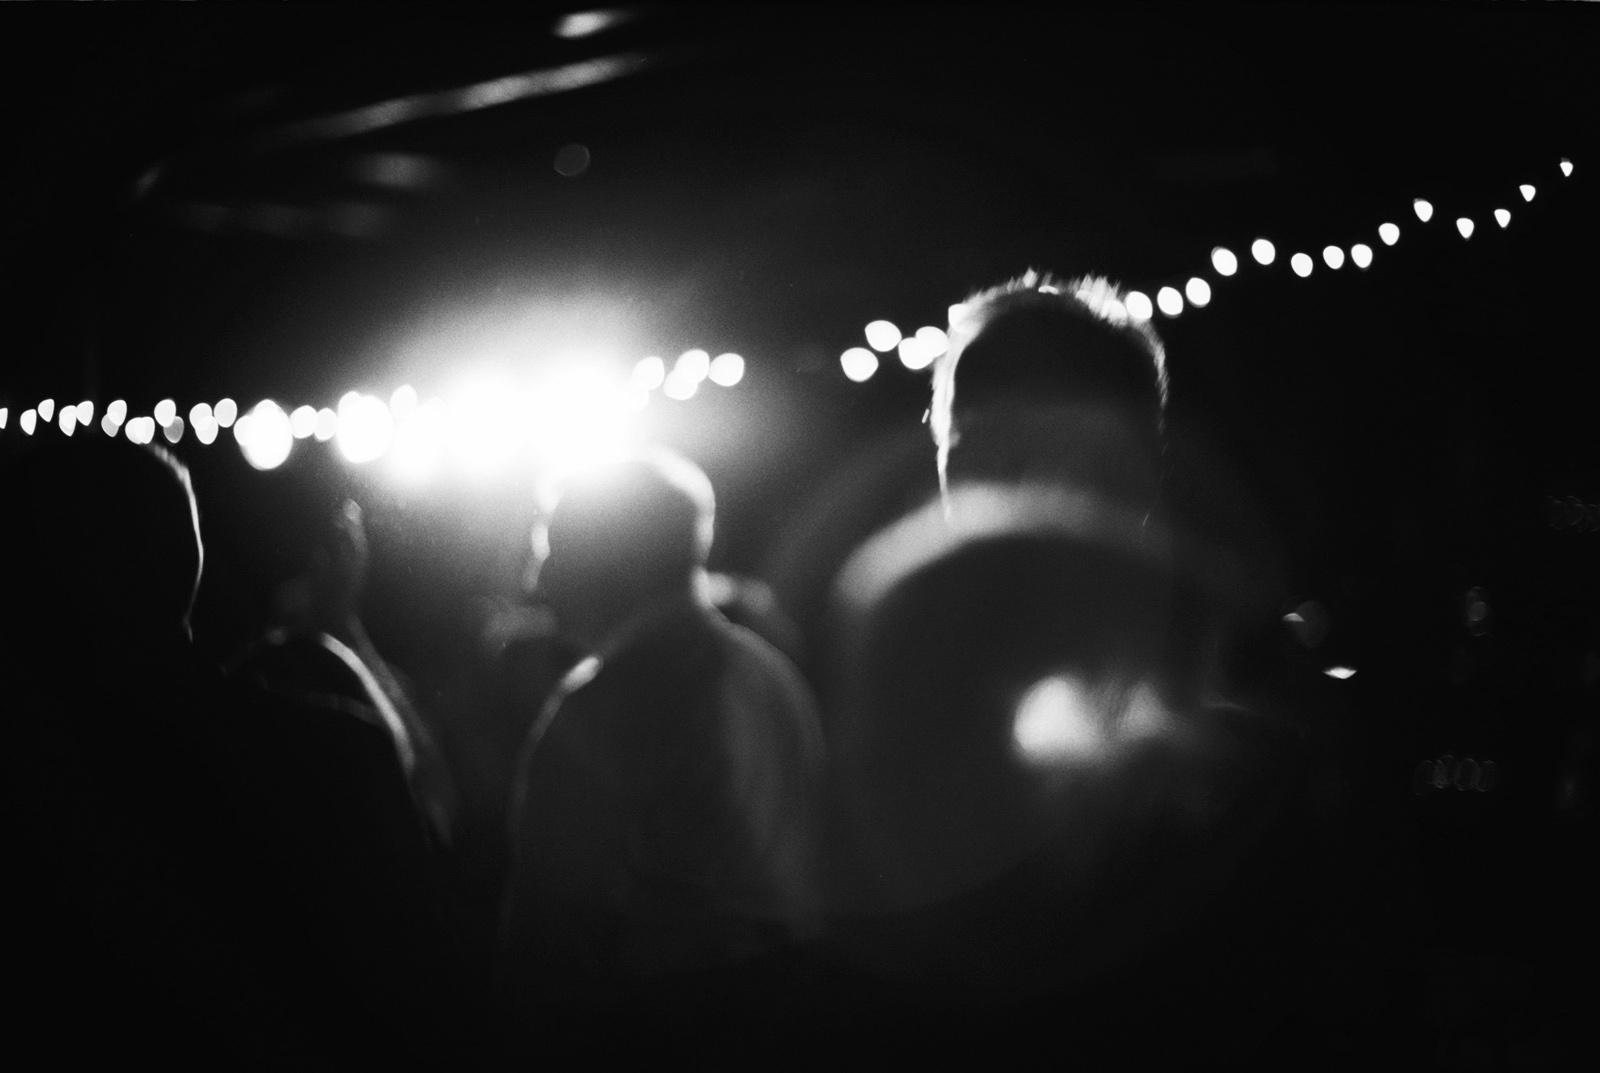 Oldani-Photography-St-Louis-Film-Photographer-Schlafly-Tap-Room-Wedding-Reception6968_14.jpg